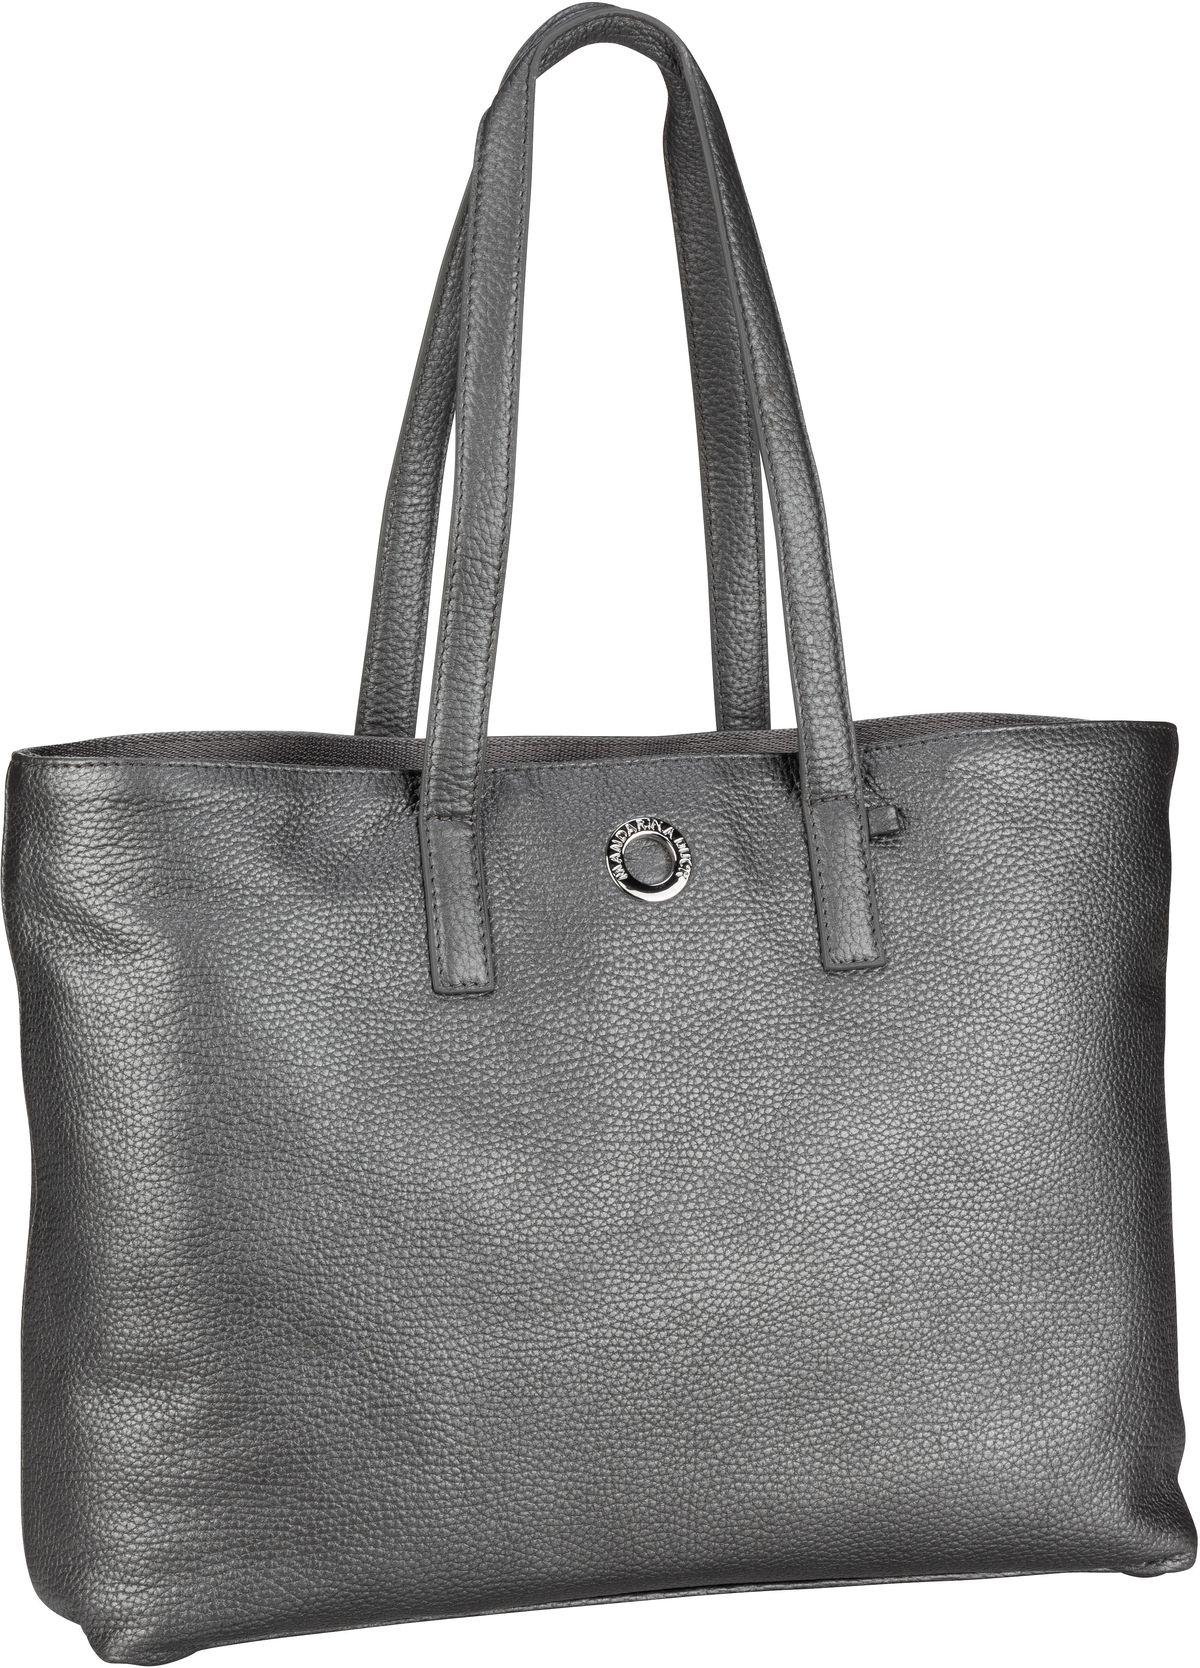 Shopper Mellow Leather Lux Tote Bag ZLT24 Lead